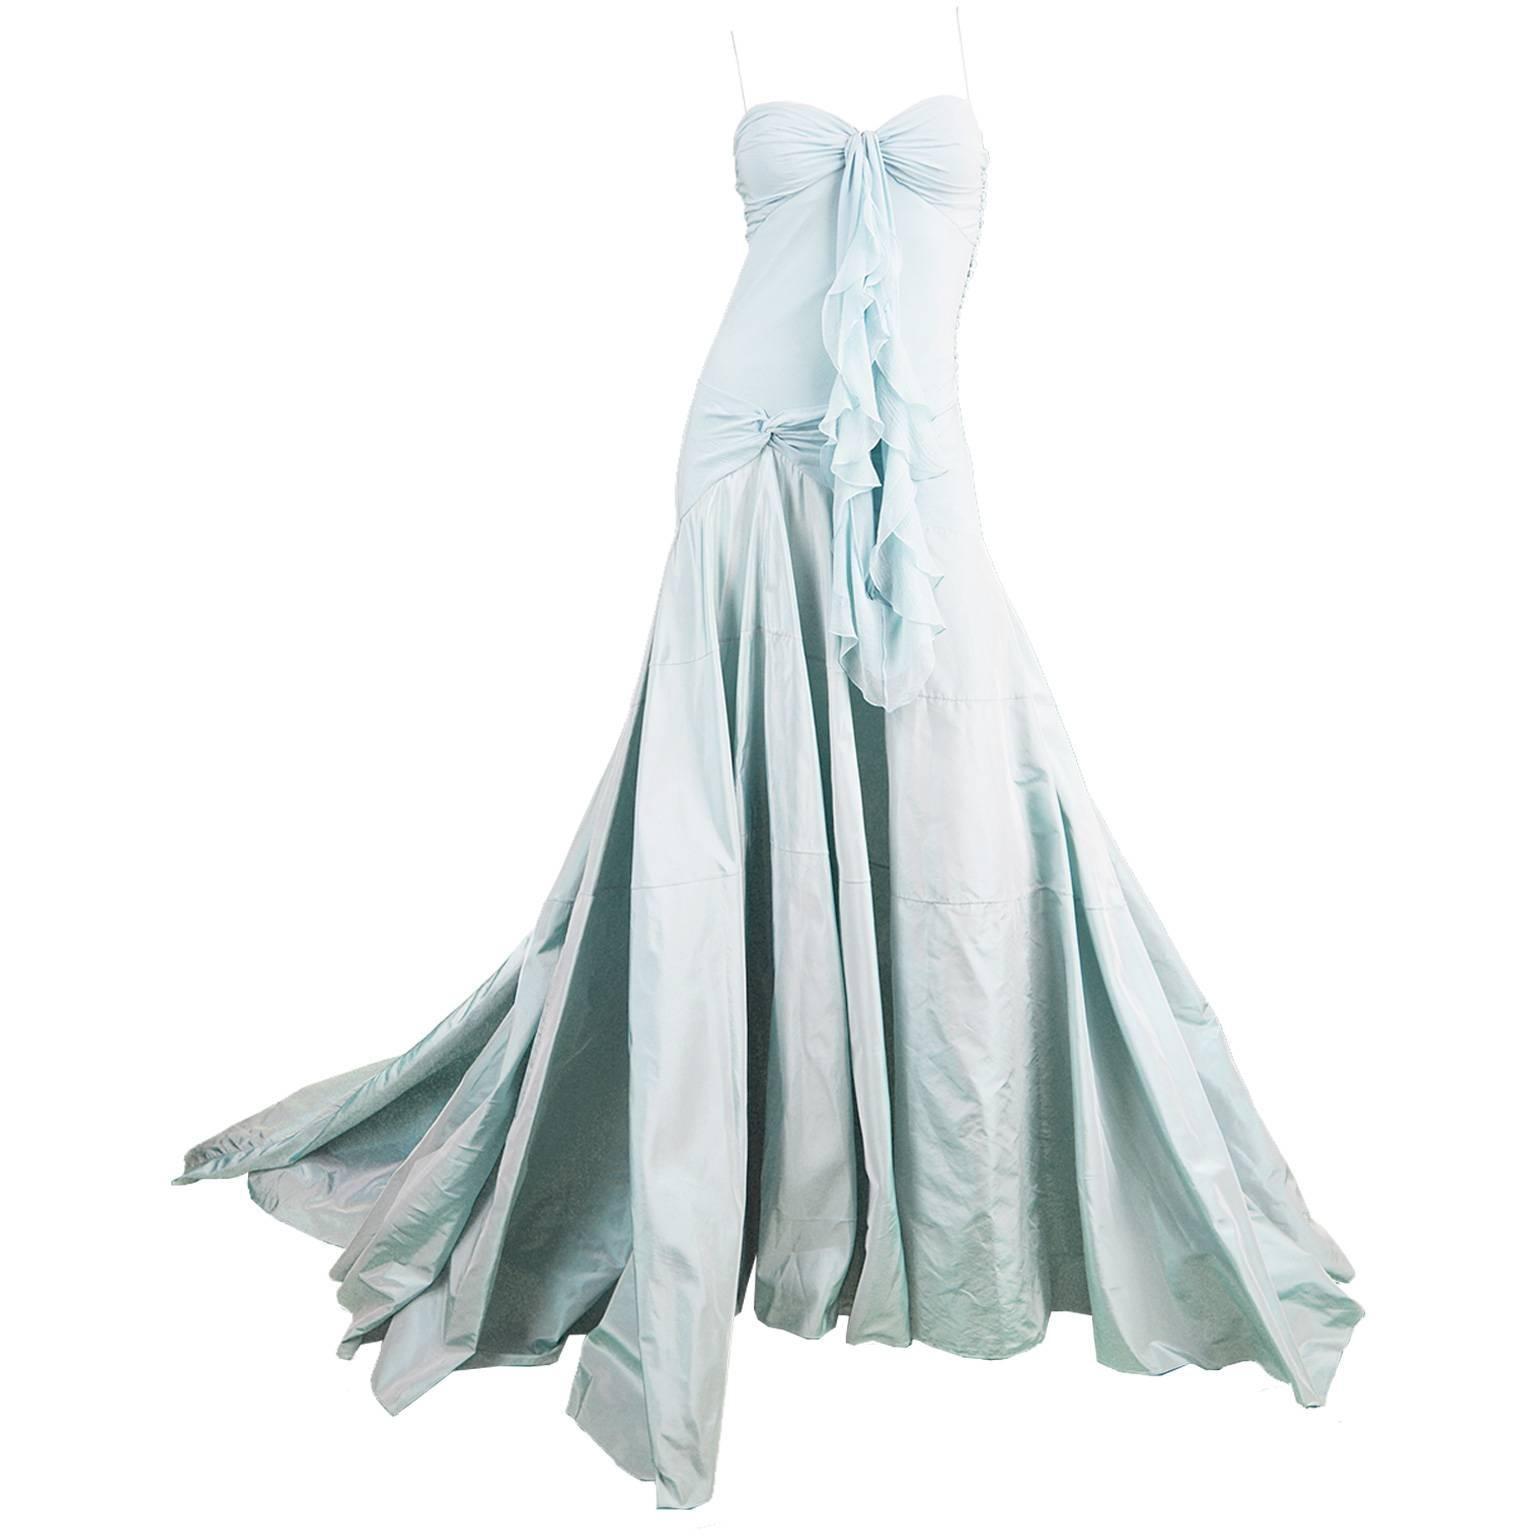 John Galliano for Christian Dior Bias Cut Silk Chiffon Gown with ...